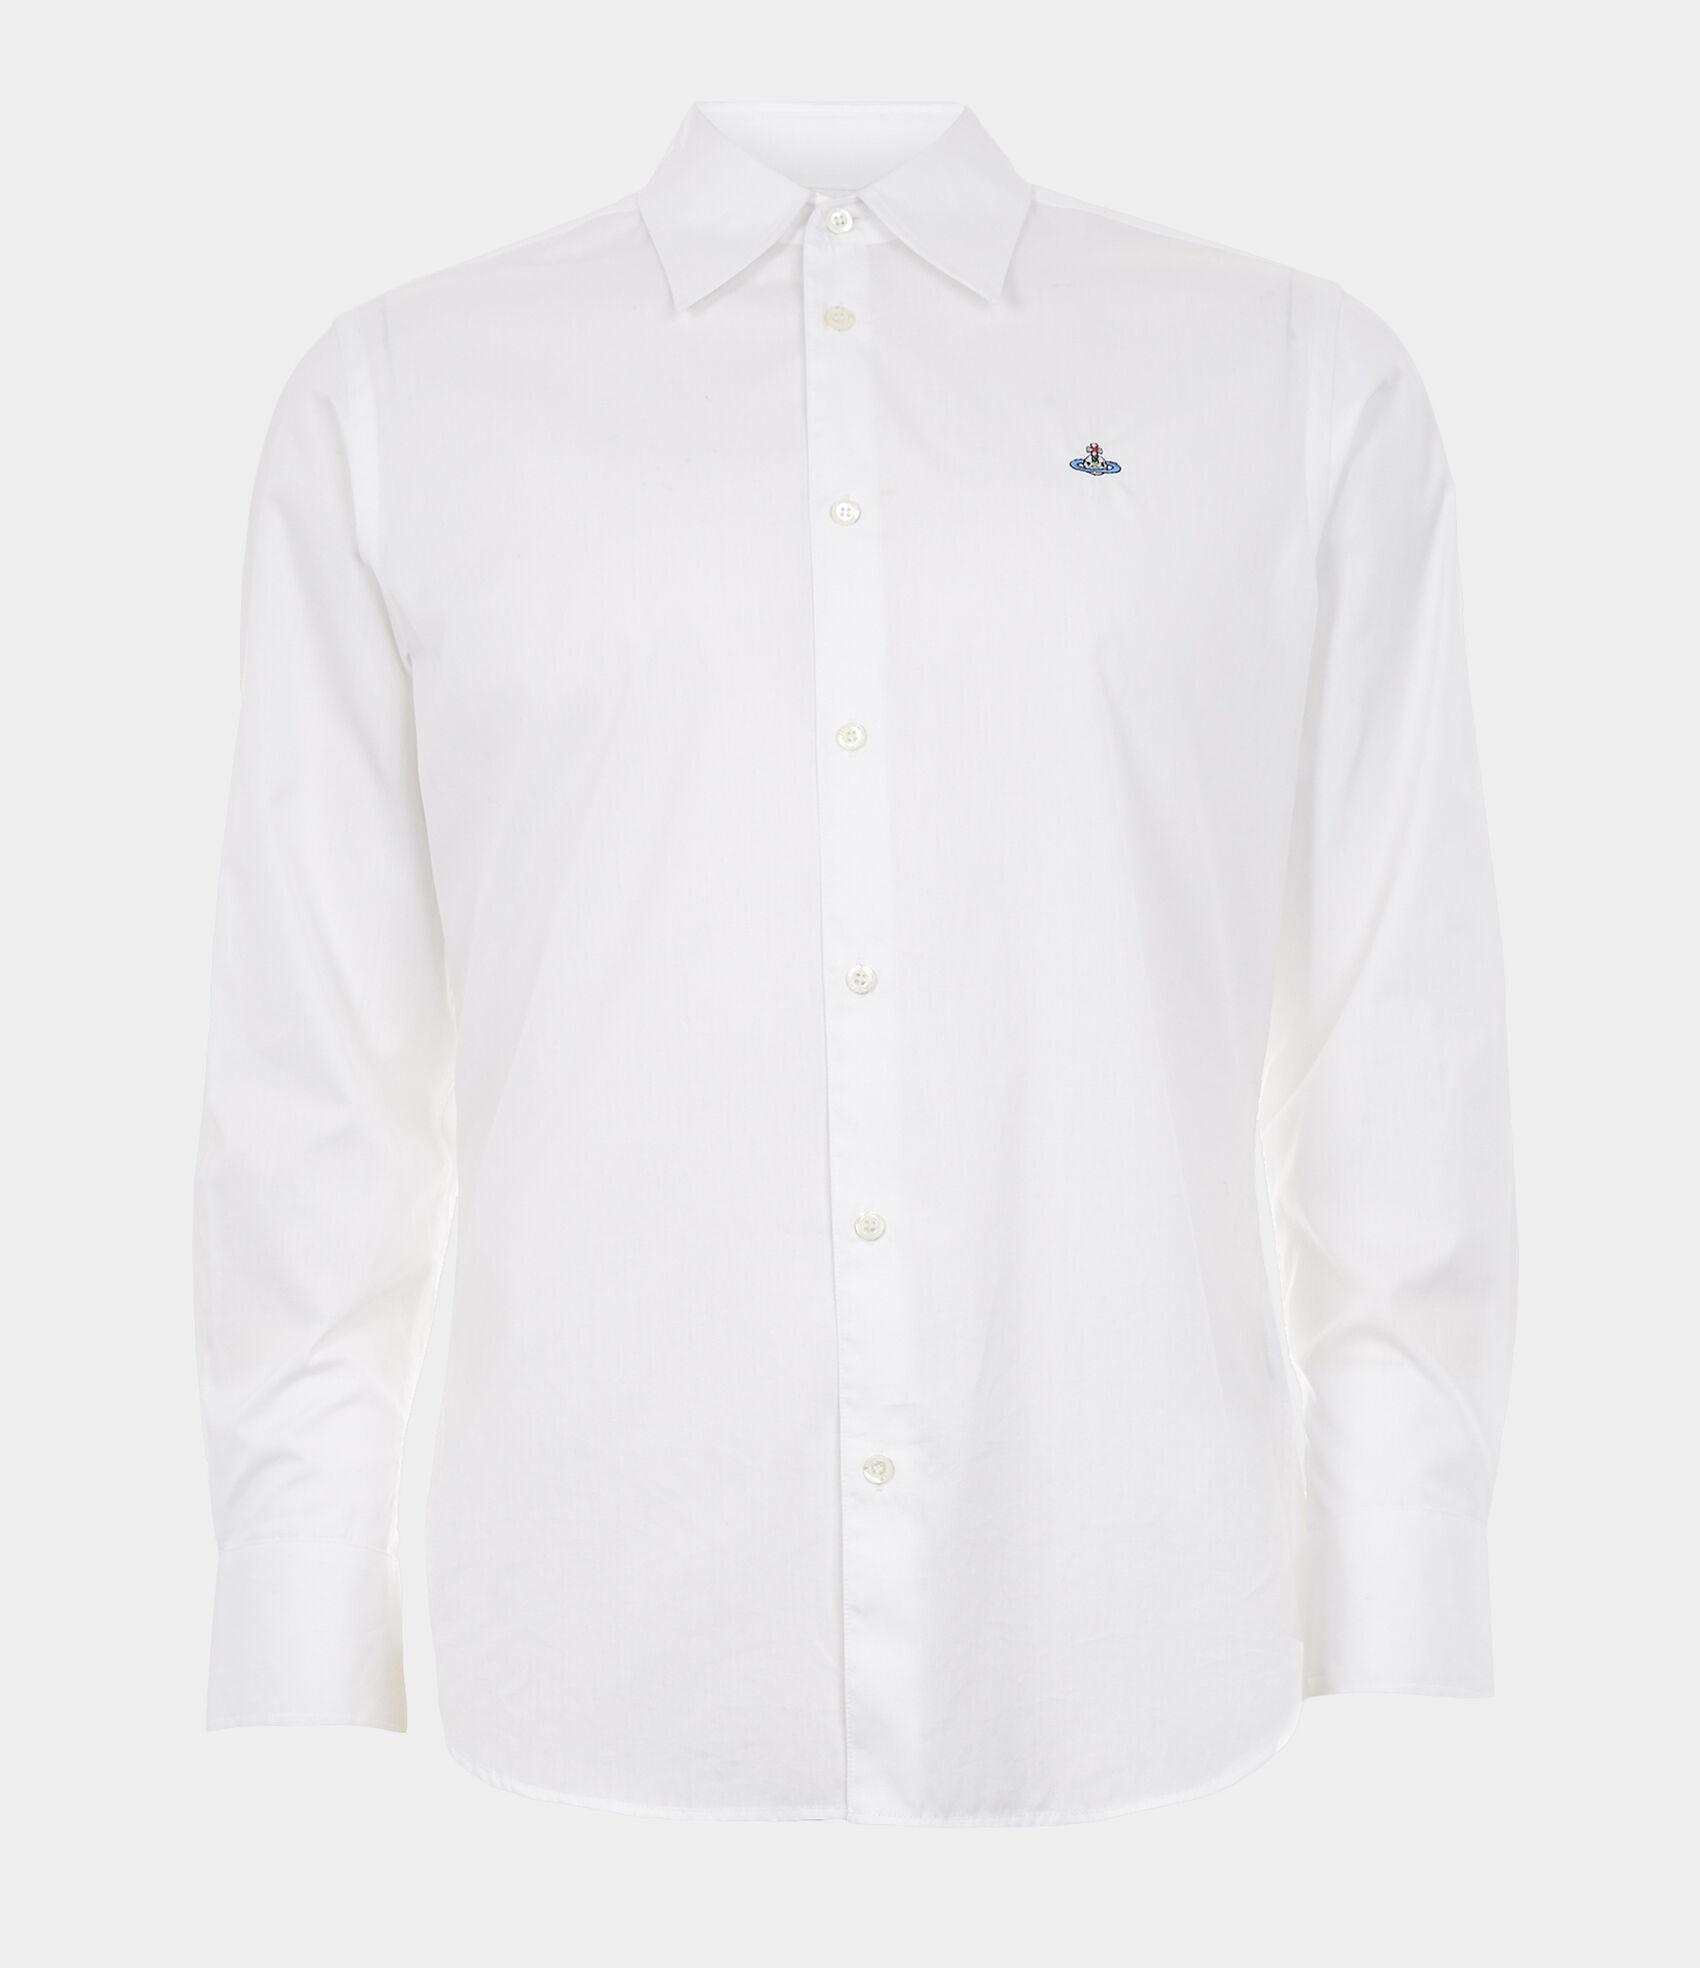 99fae786dc Vivienne Westwood Men's Designer Shirts | Men's Shirt | Vivienne ...